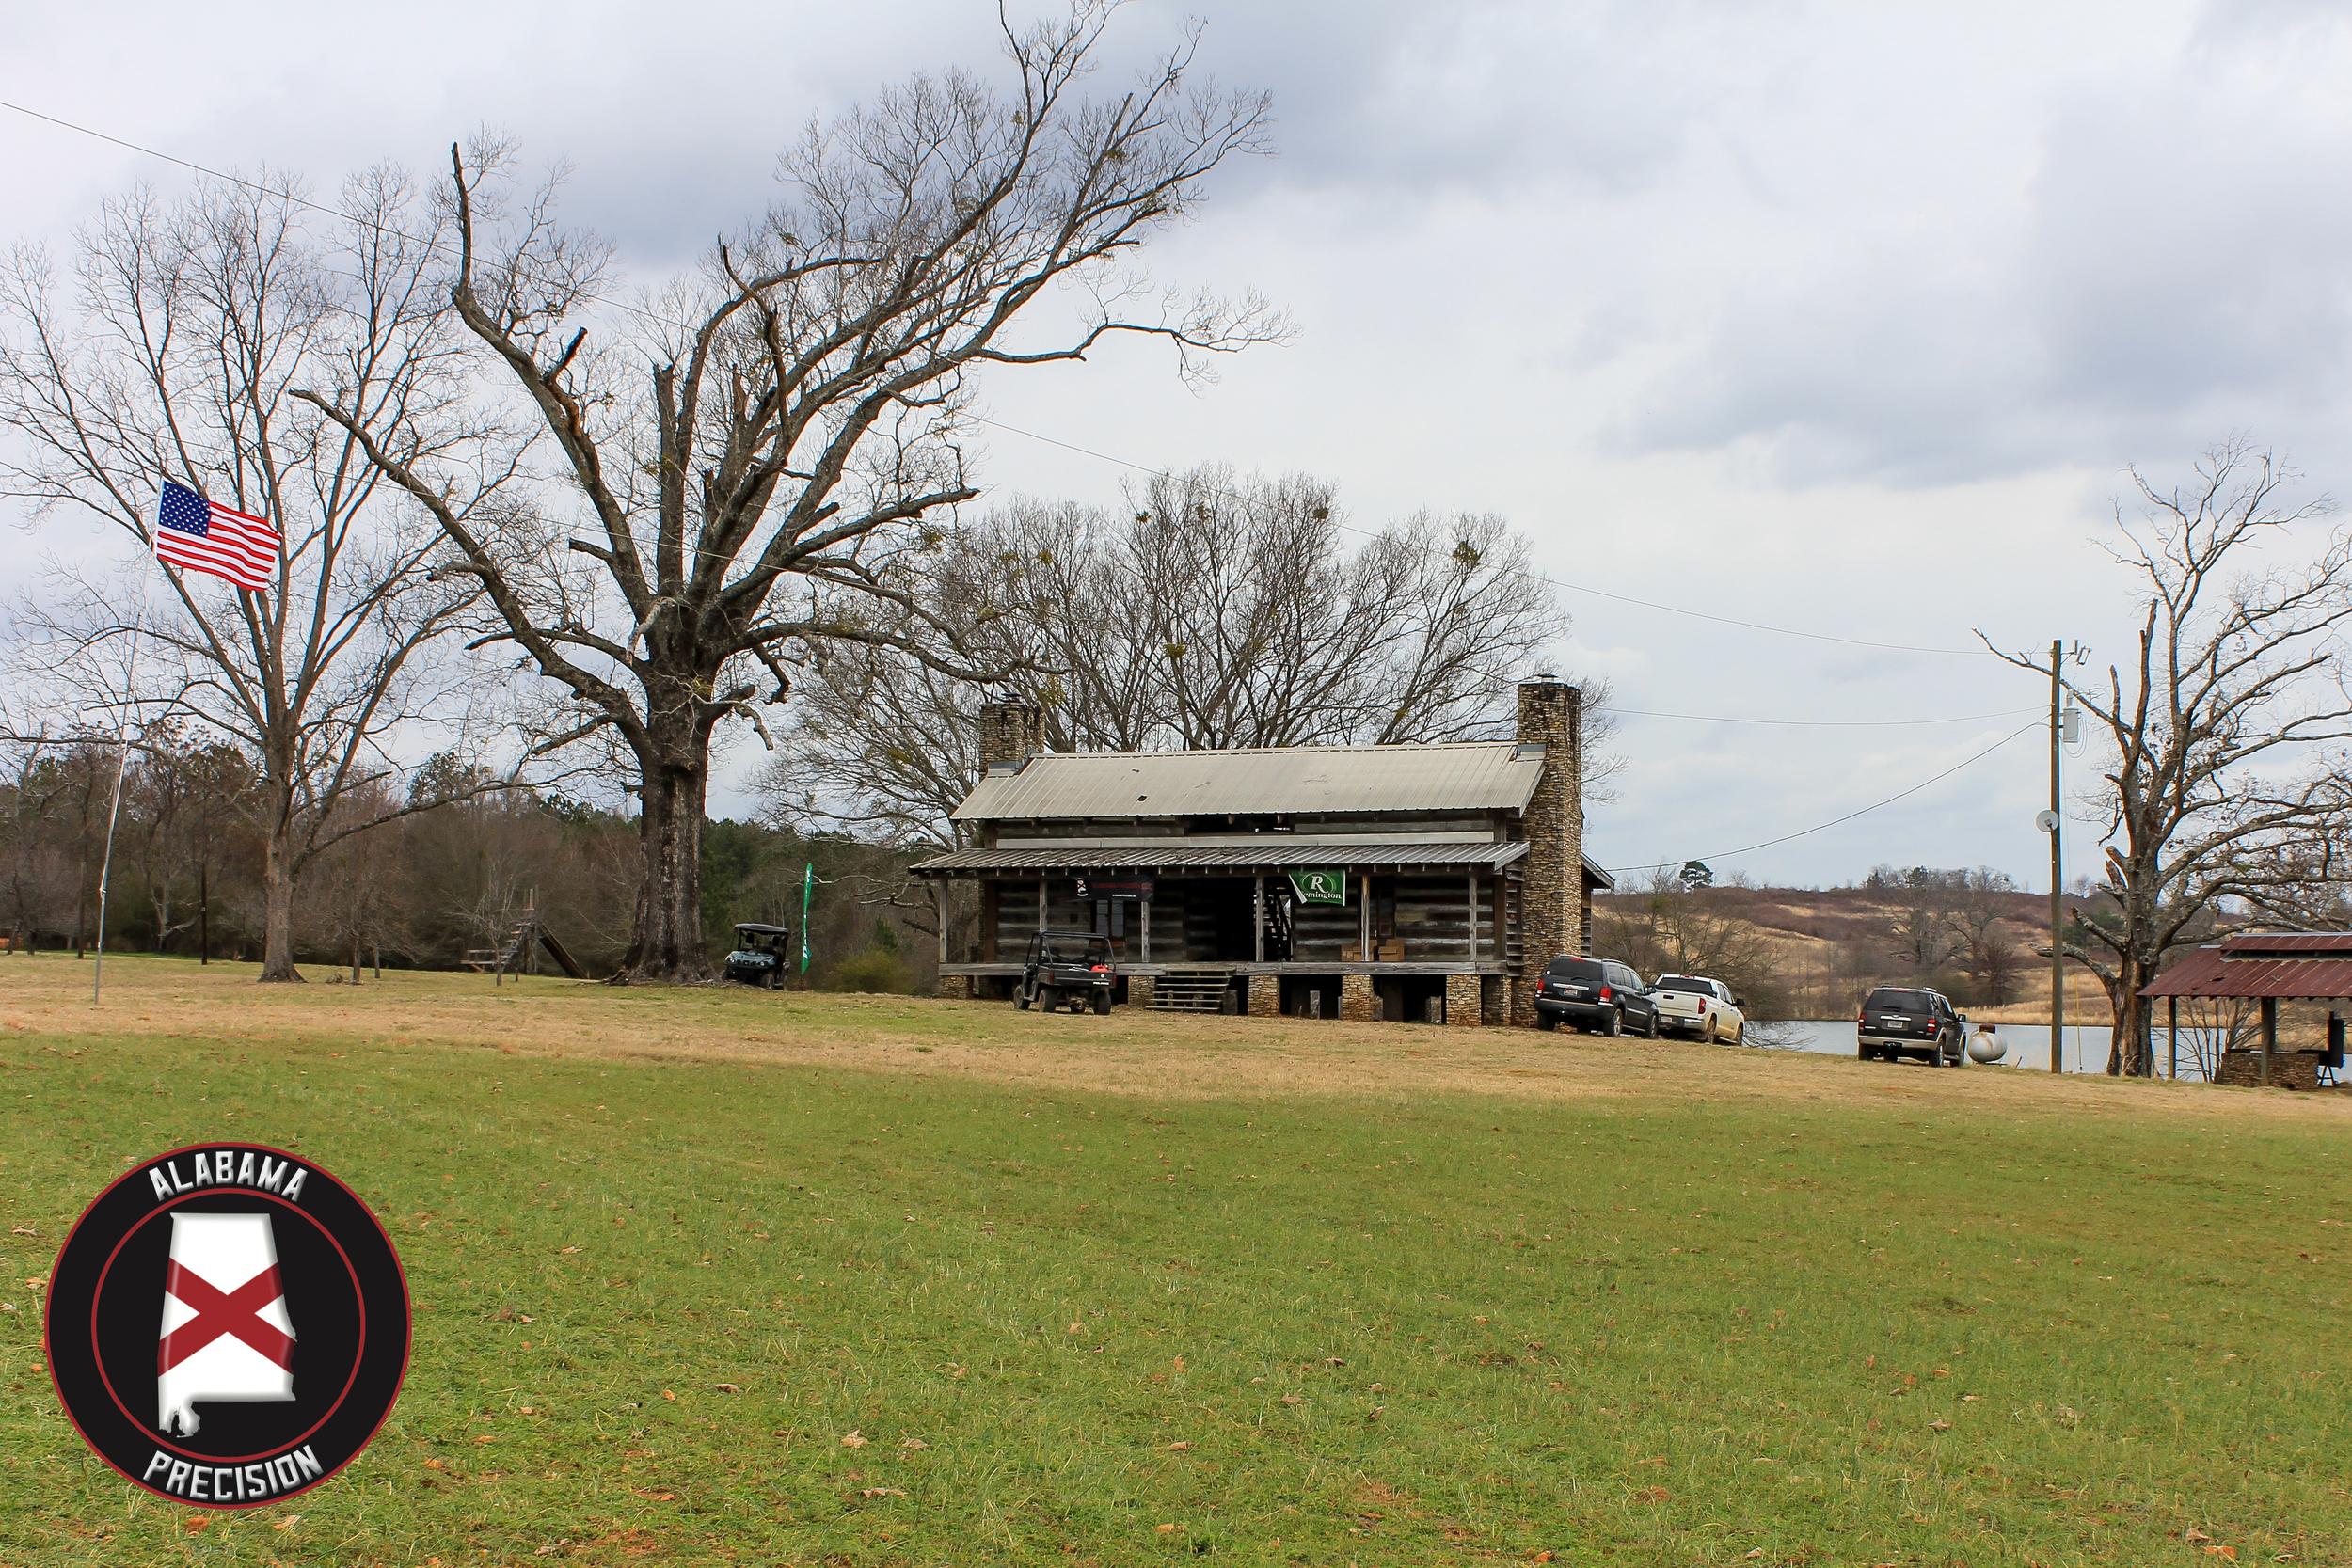 2016-02 Alabama Precision -53.jpg